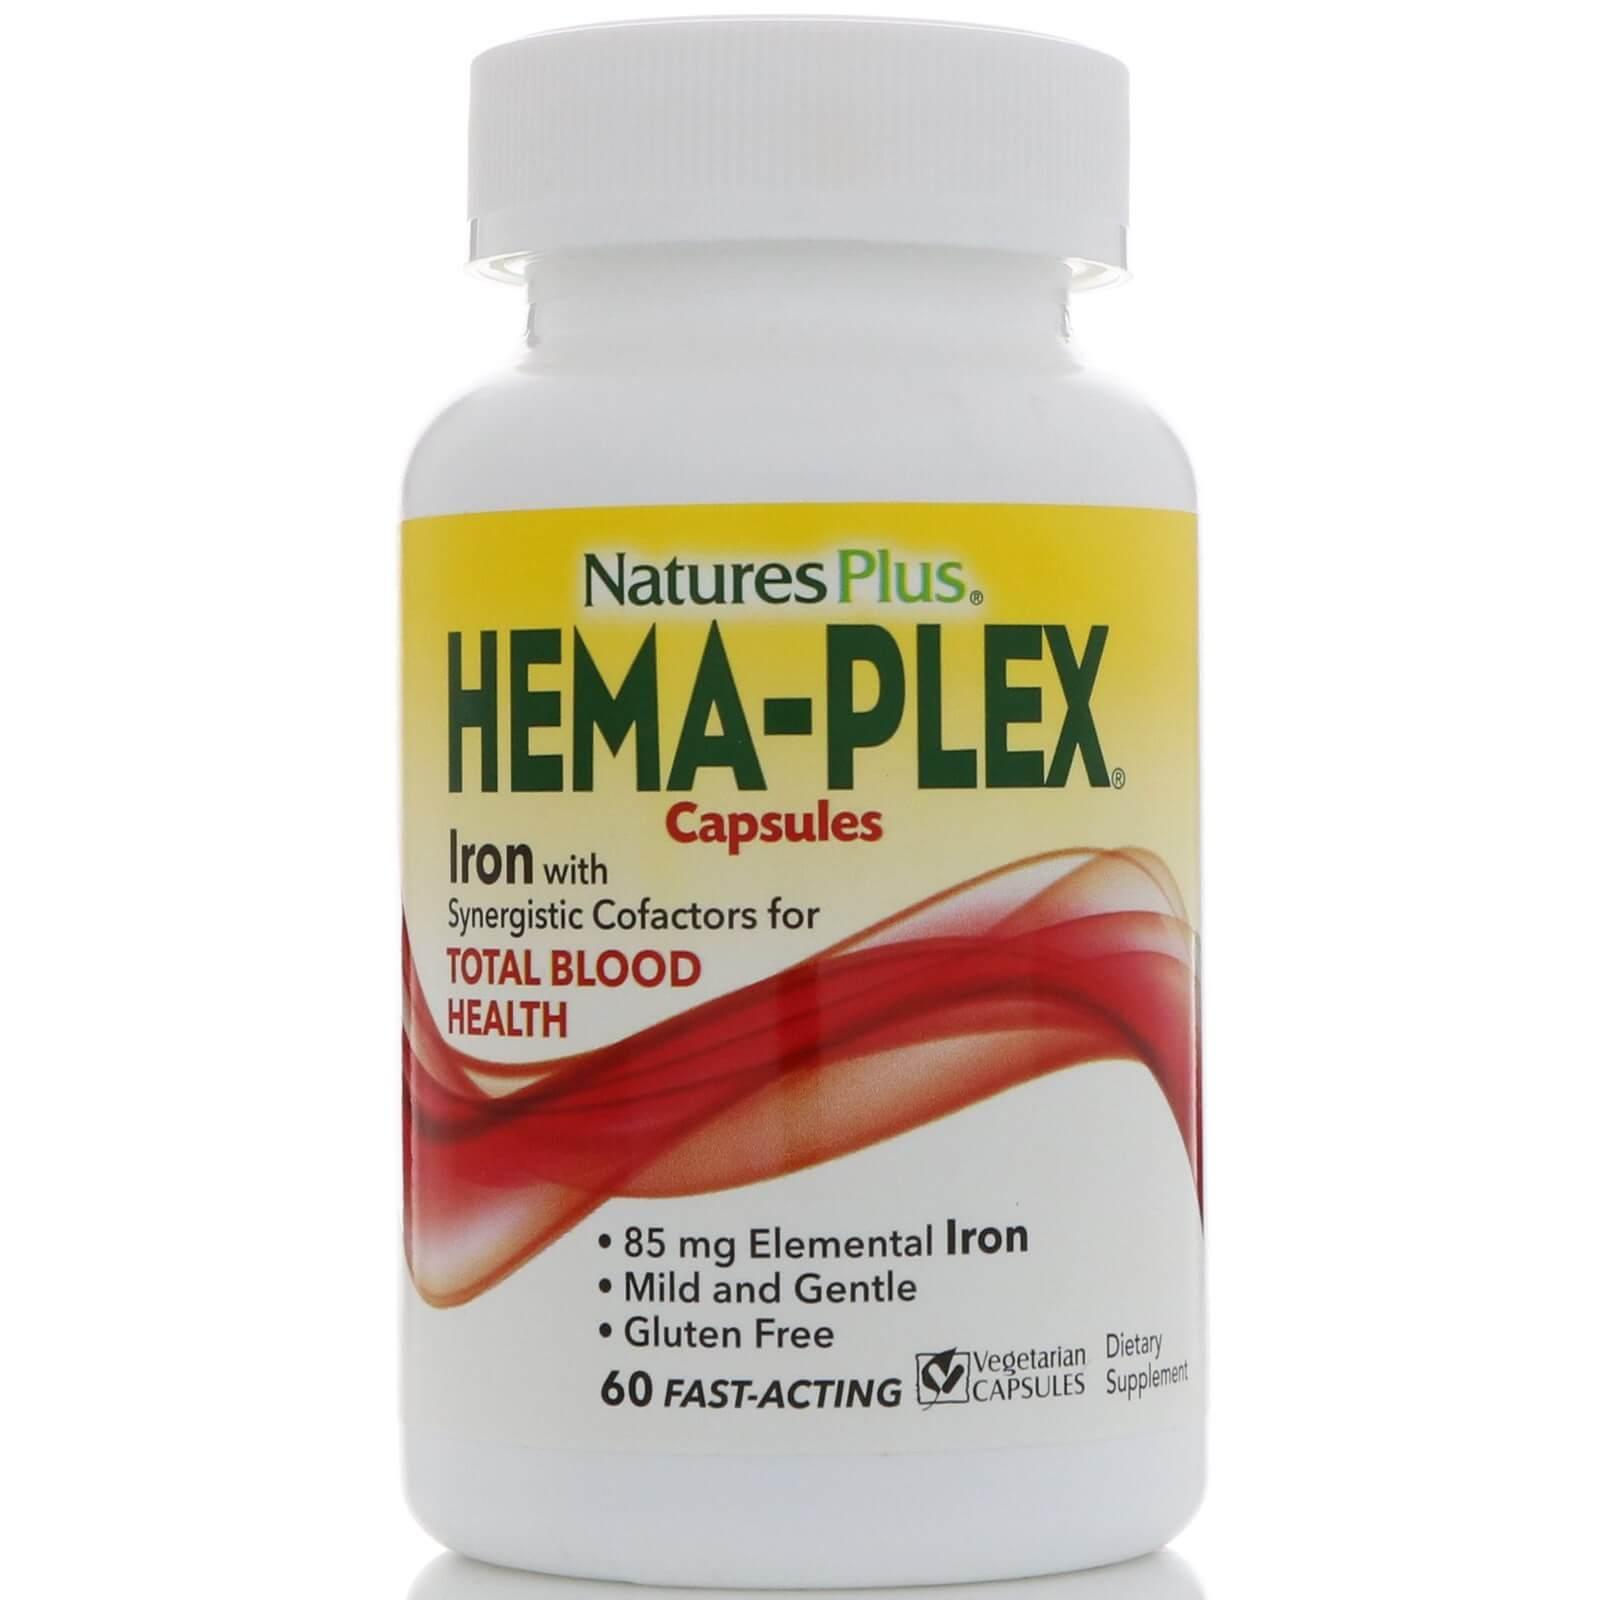 Natures Plus Hema-Plex Συμπλήρωμα Διατροφής με Εξαιρετική Φόρμουλα για τη Βελτίωση της Ποιότητας του Αίματος 60caps